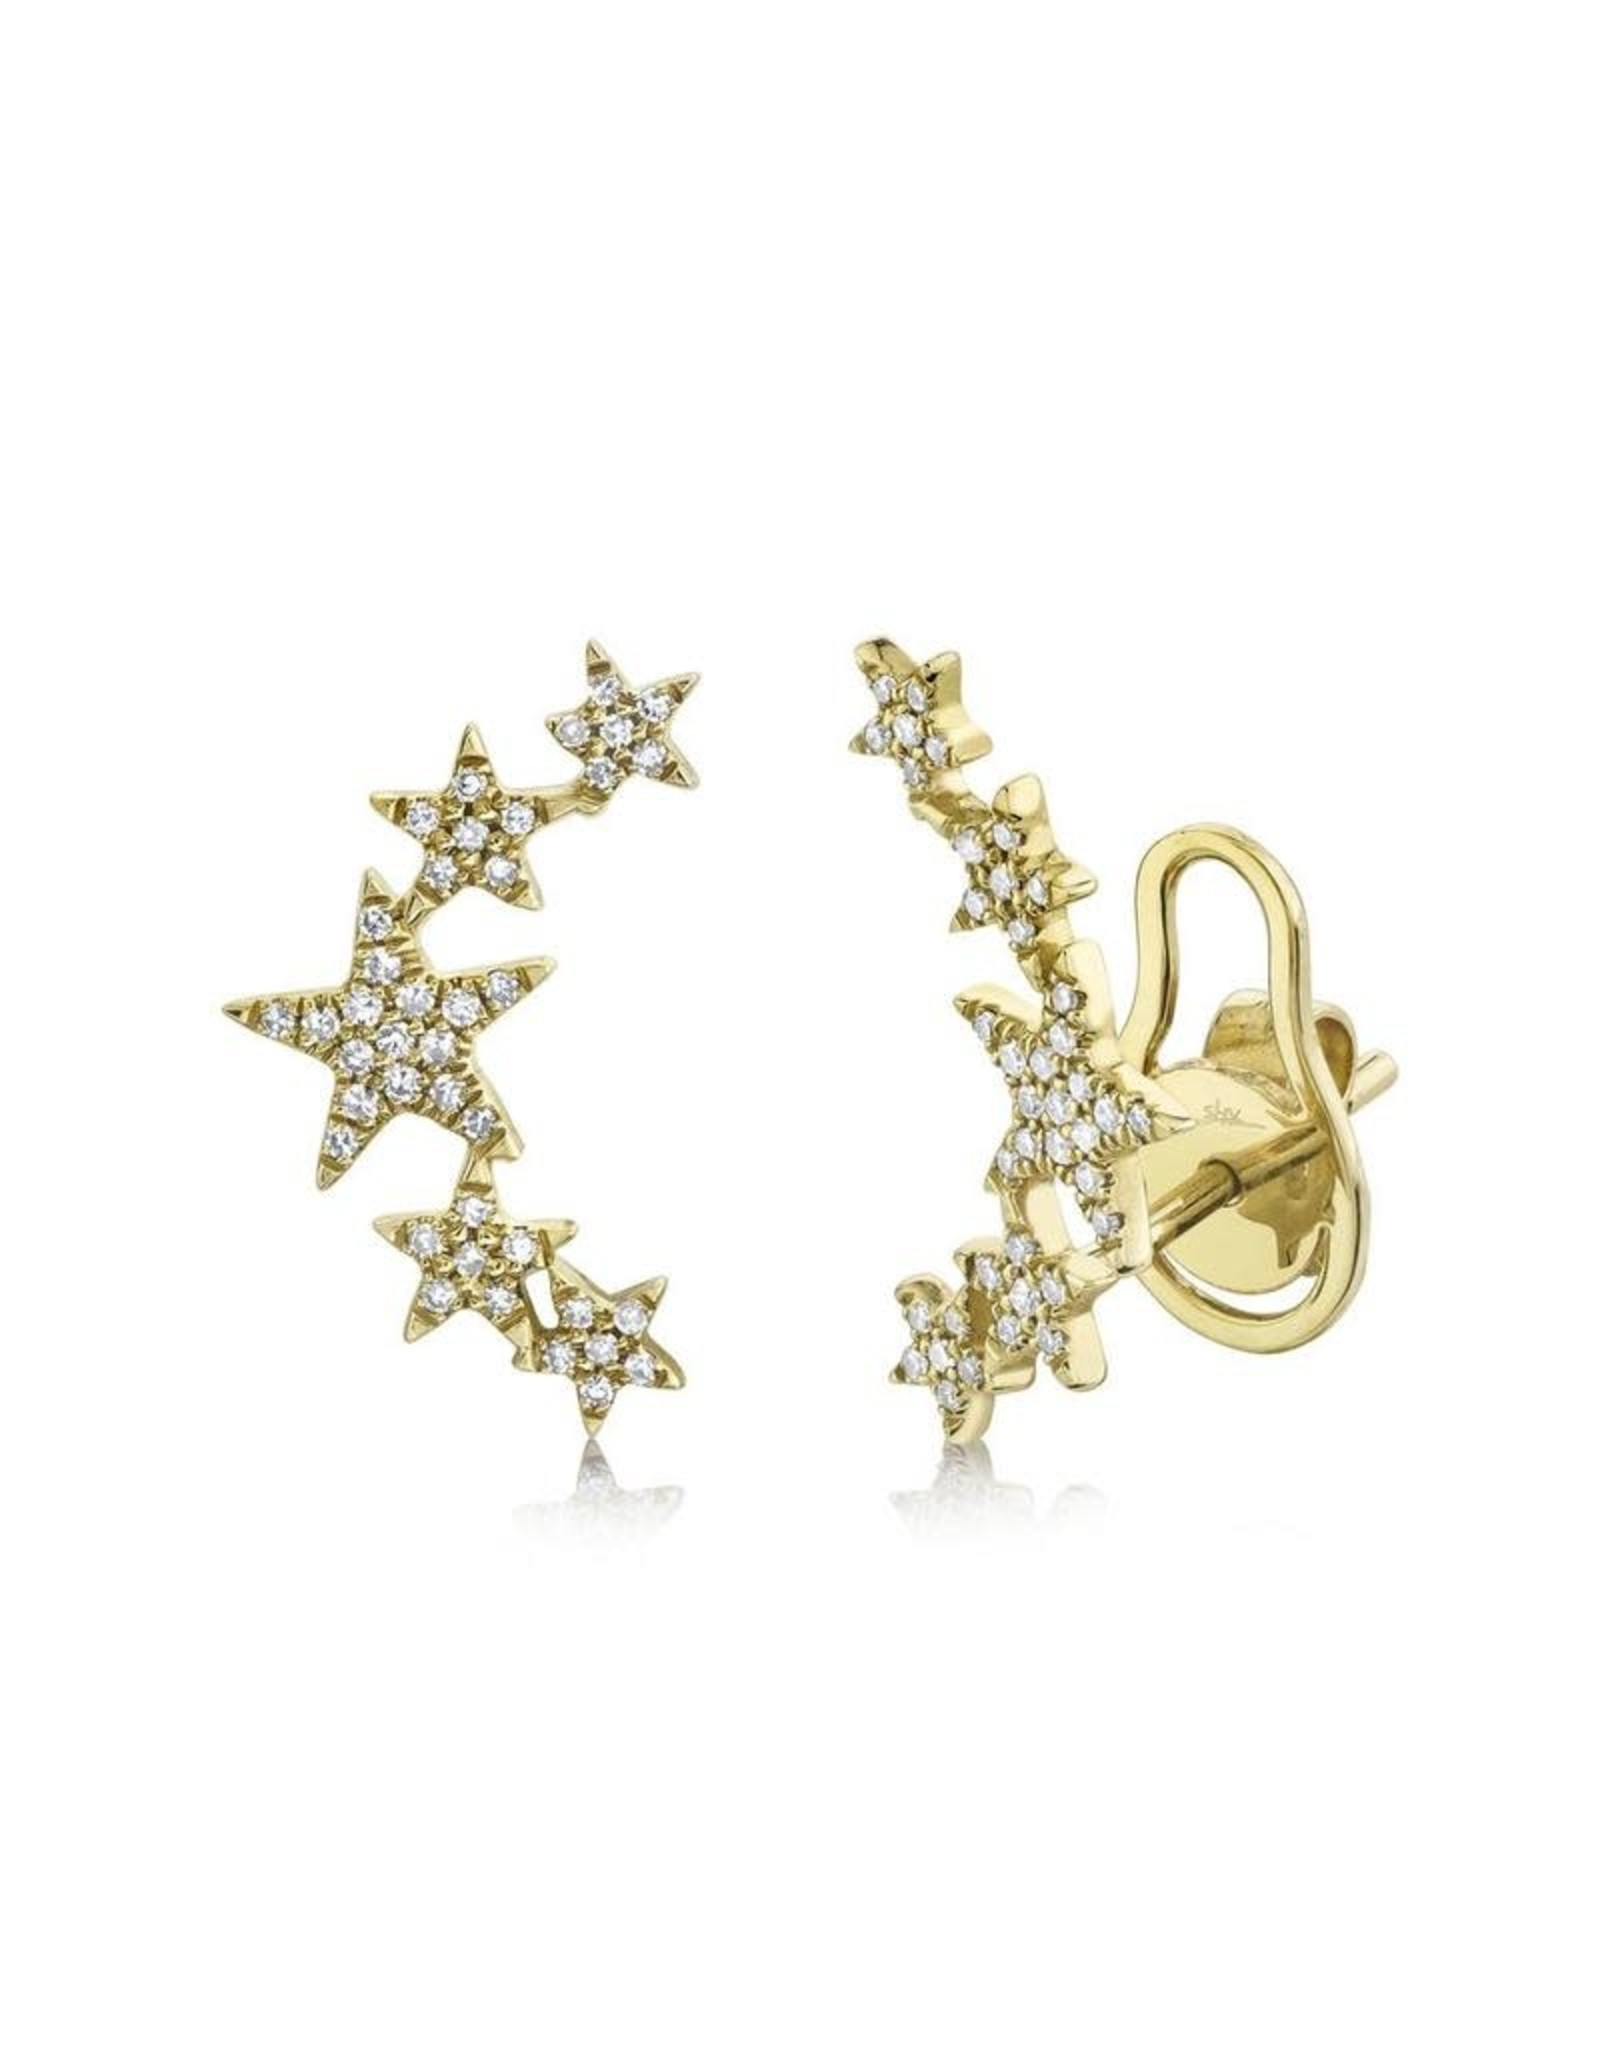 14K Yellow Gold Diamond Star Earring Climbers, D: 0.17ct